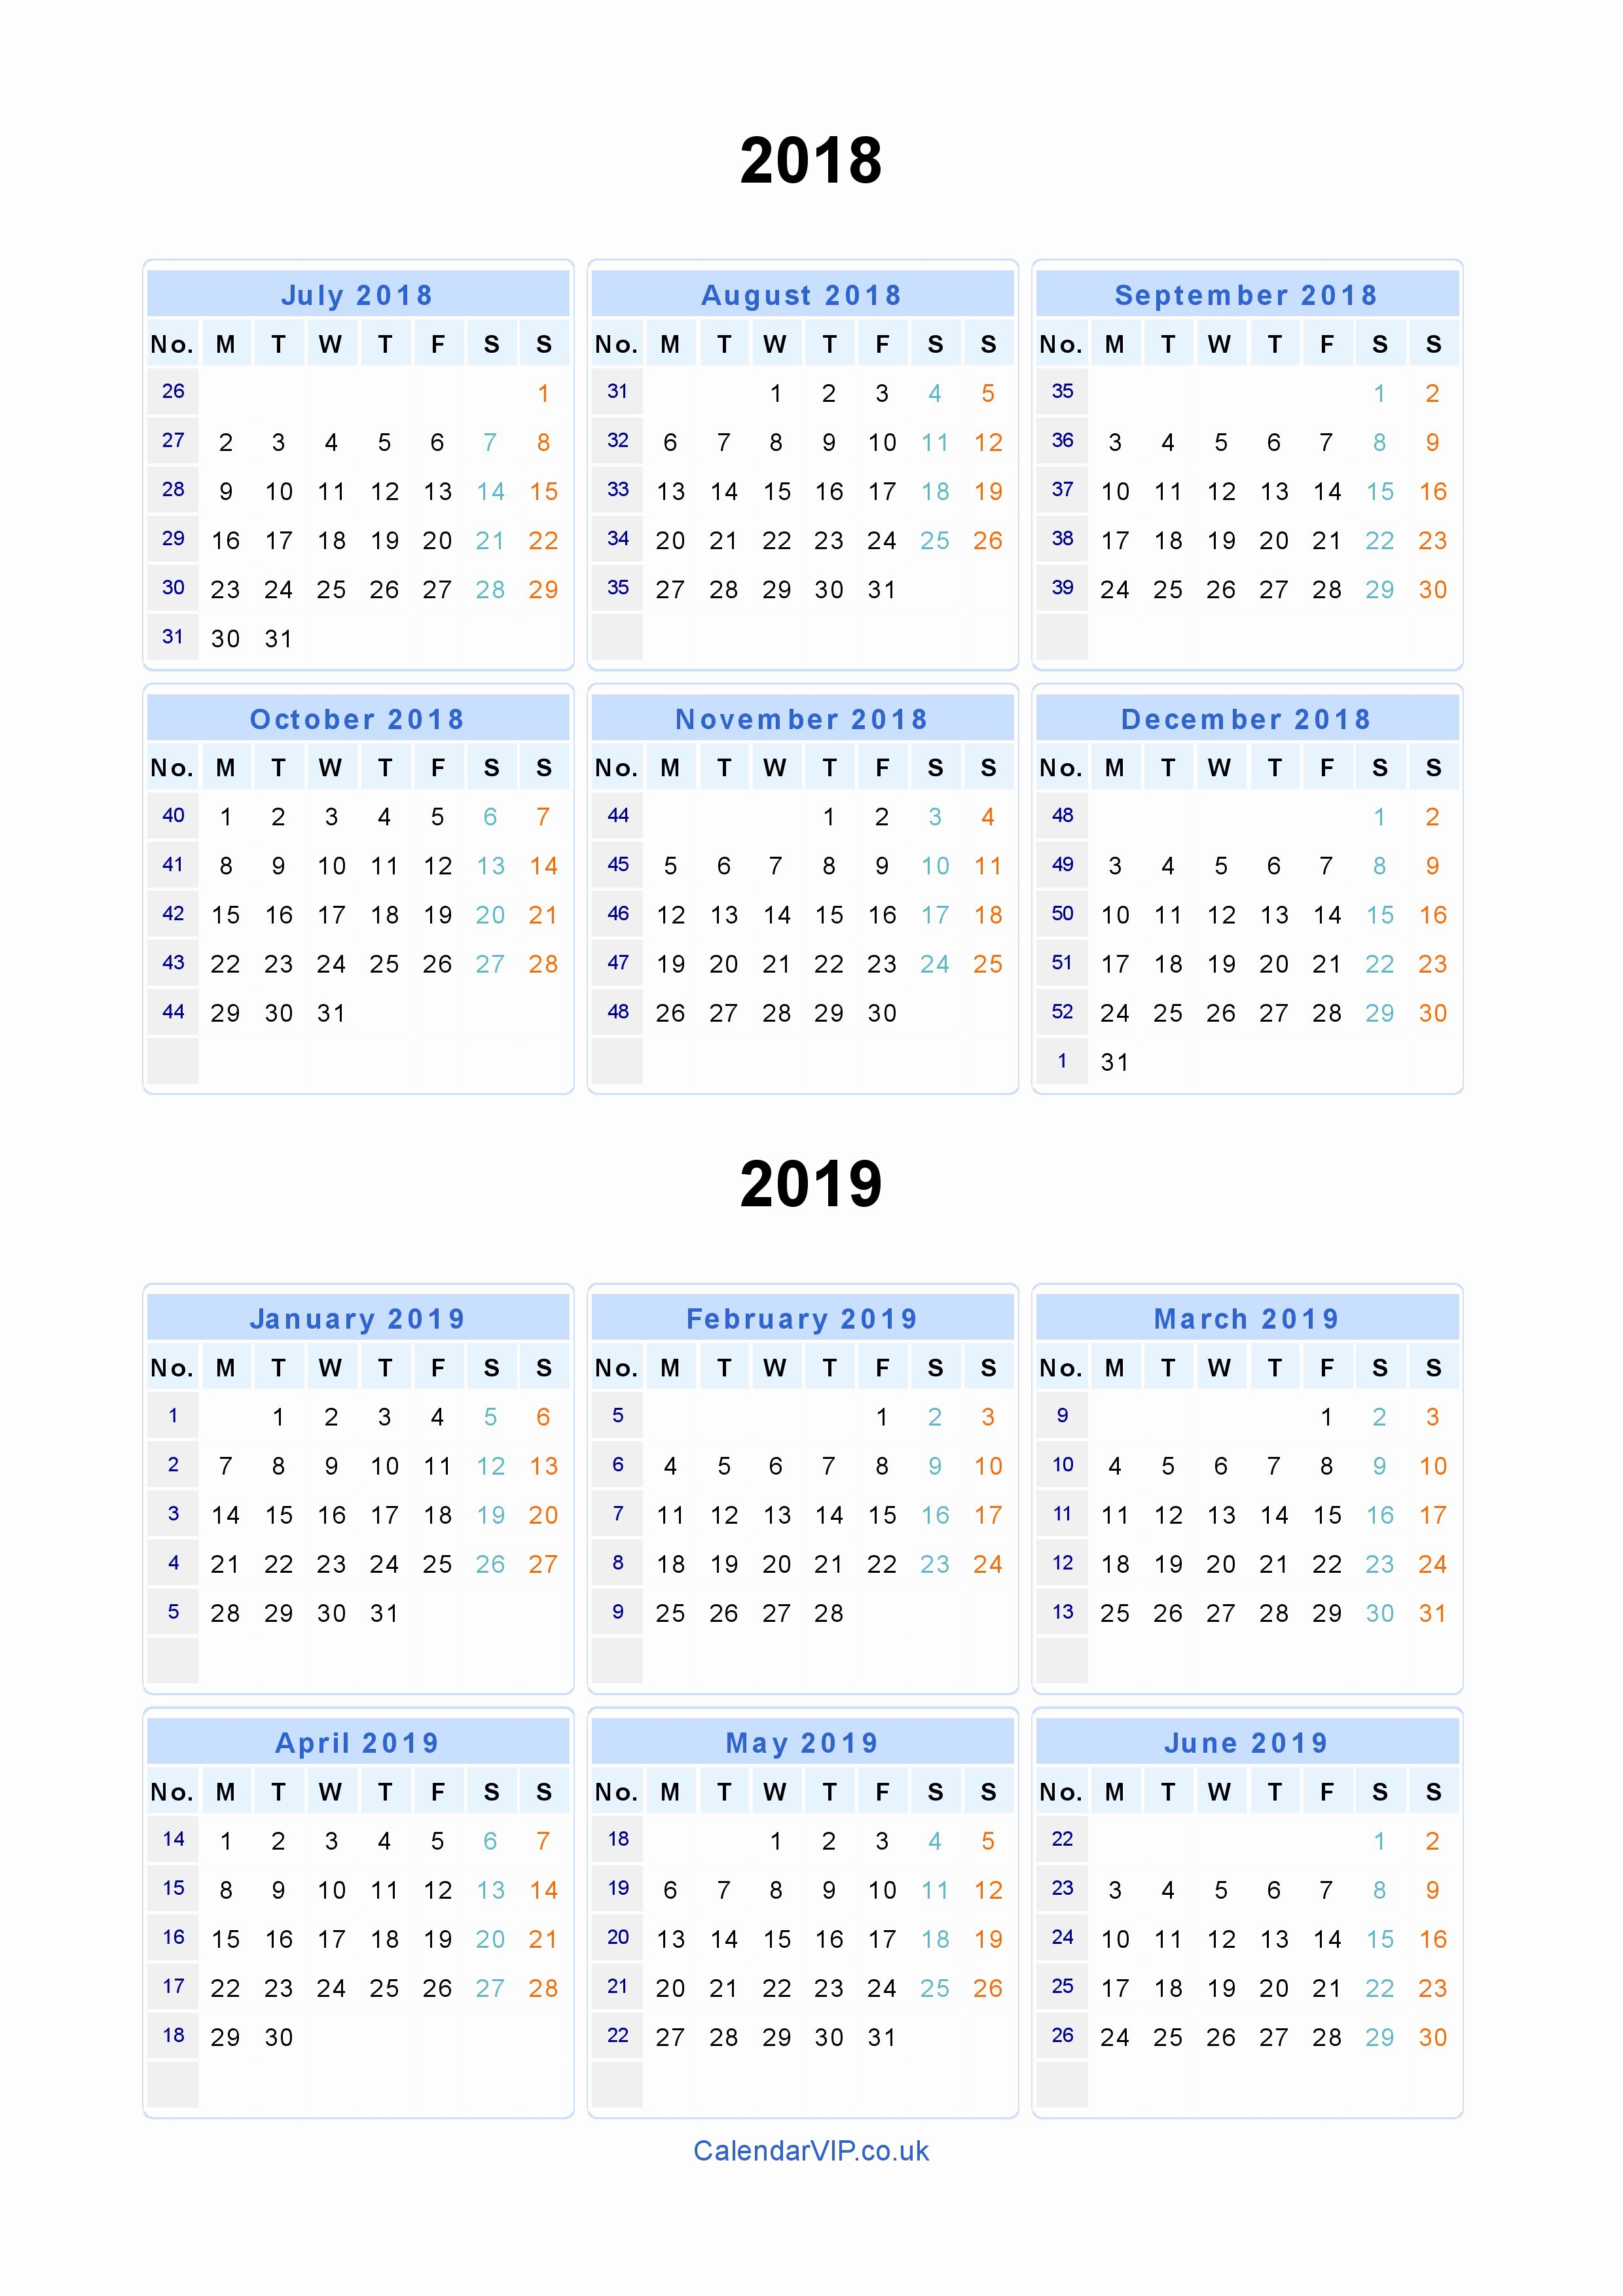 Printable 2018 and 2019 Calendar Beautiful Split Year Calendars 2018 2019 Calendar From July 2018